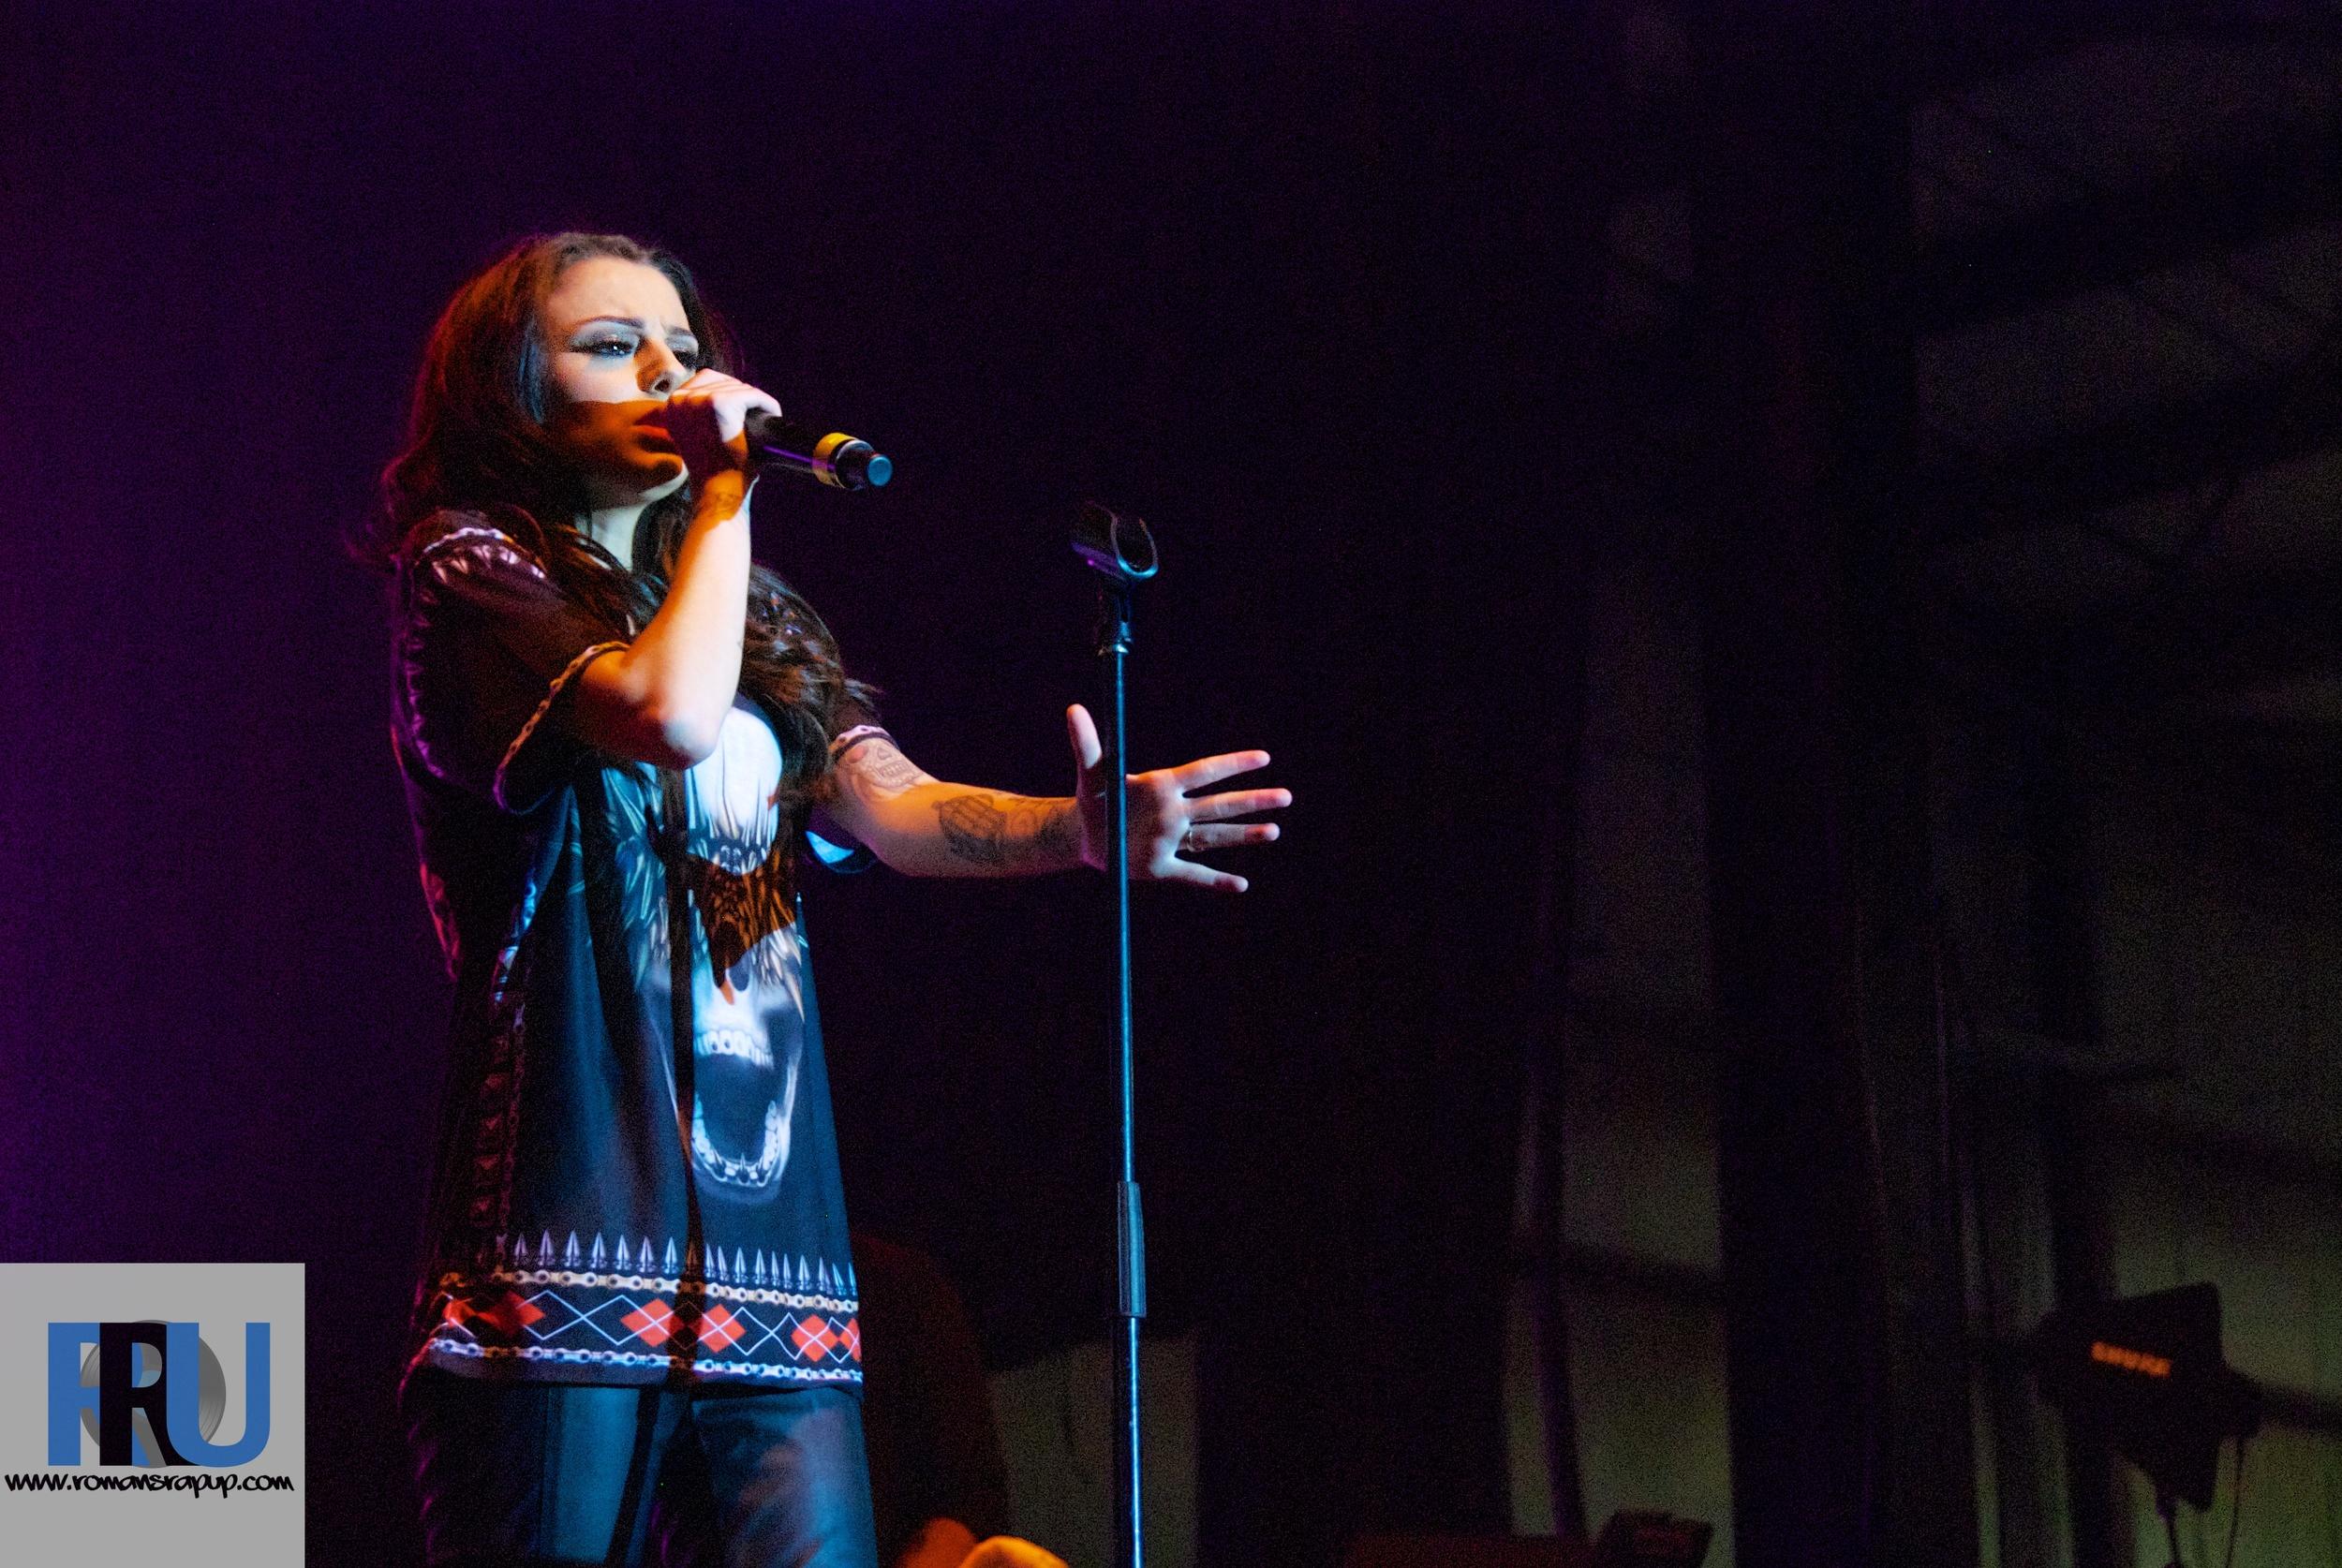 Cher Lloyd Topsfield Fair 10-12-13 57.jpg